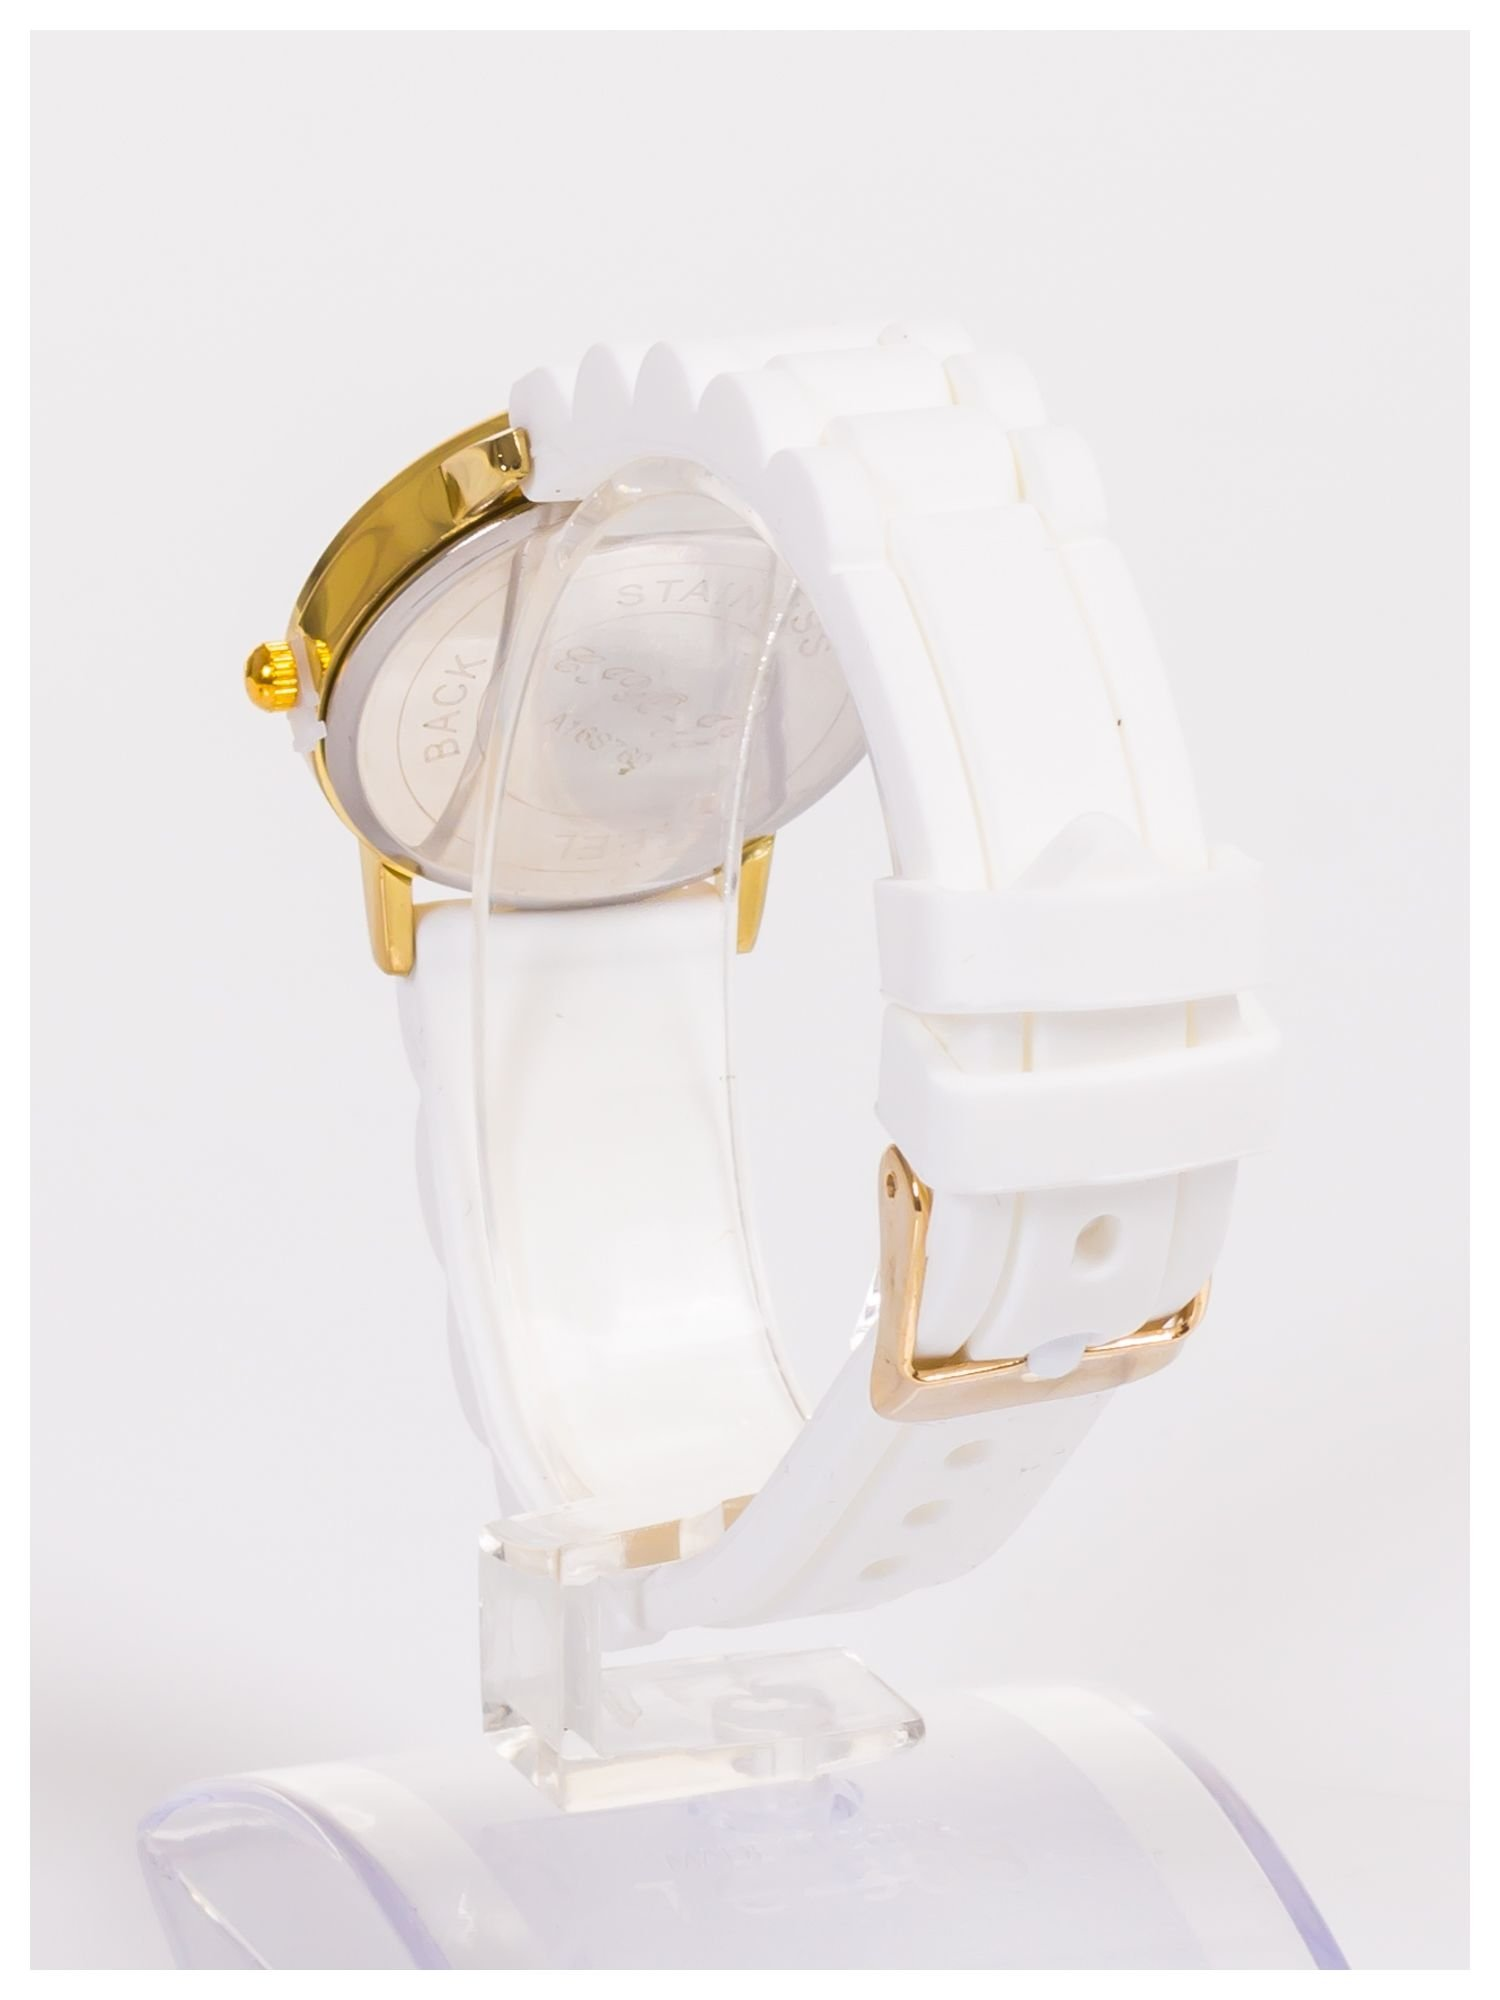 Damski zegarek z ozdobnym chronografem na tarczy                                  zdj.                                  4